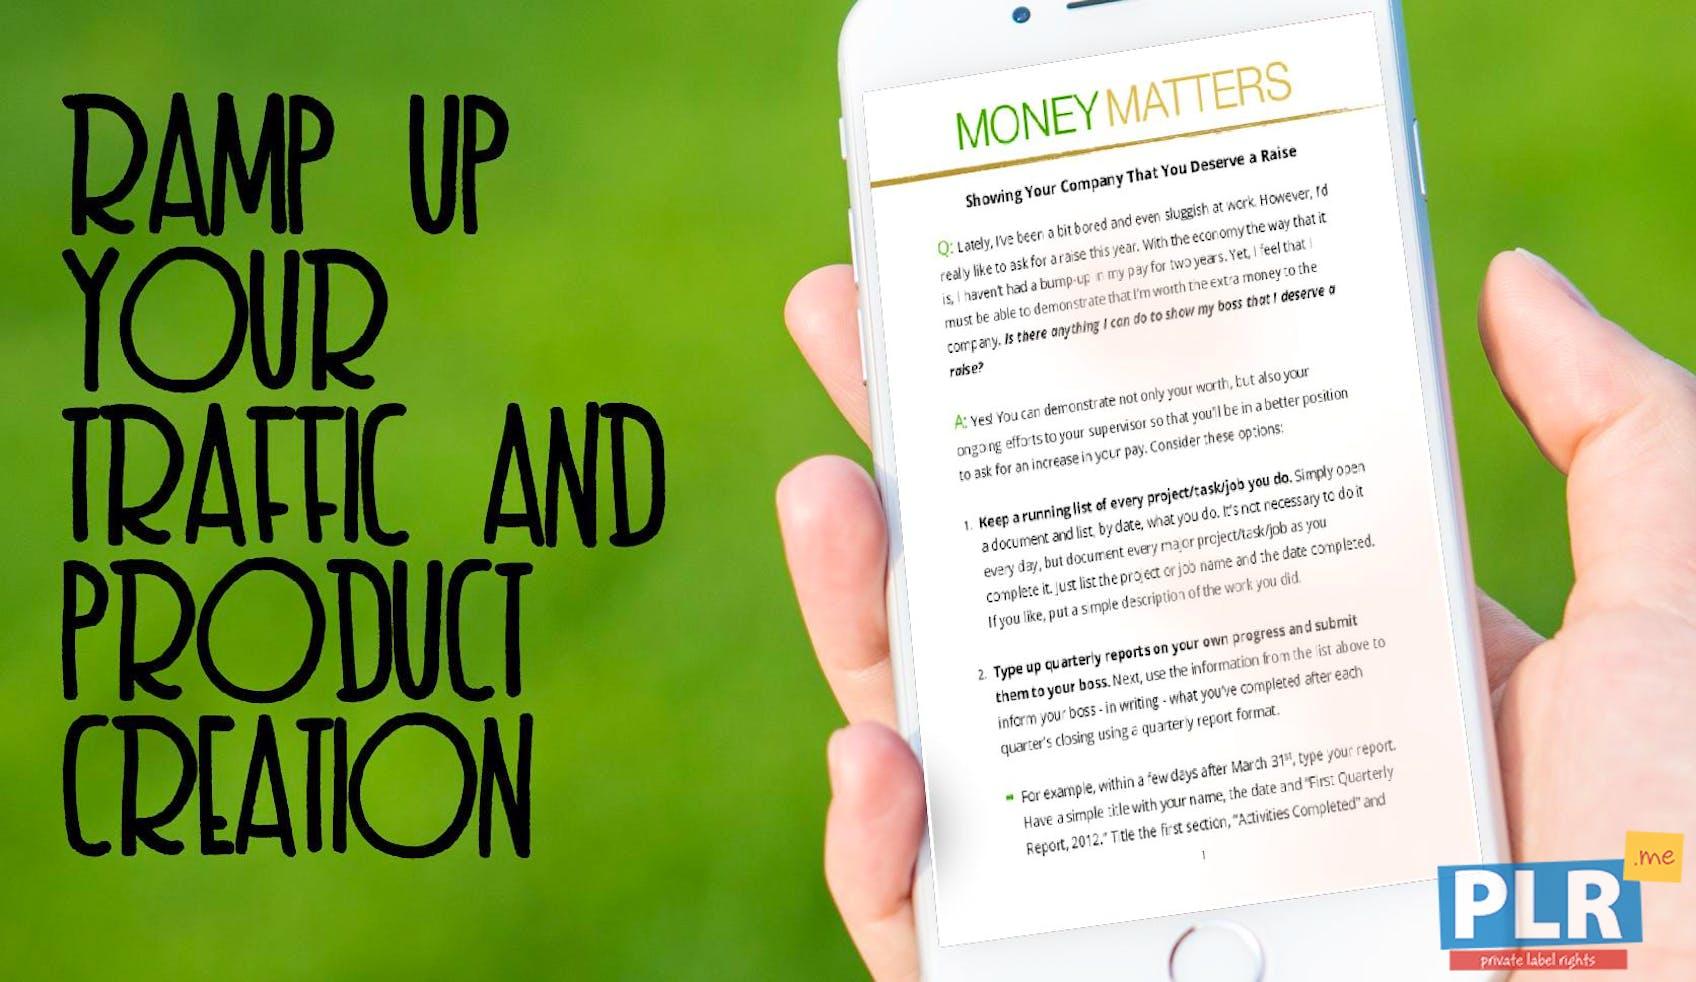 Money Matters Showing Your Company That You Deserve A Raise